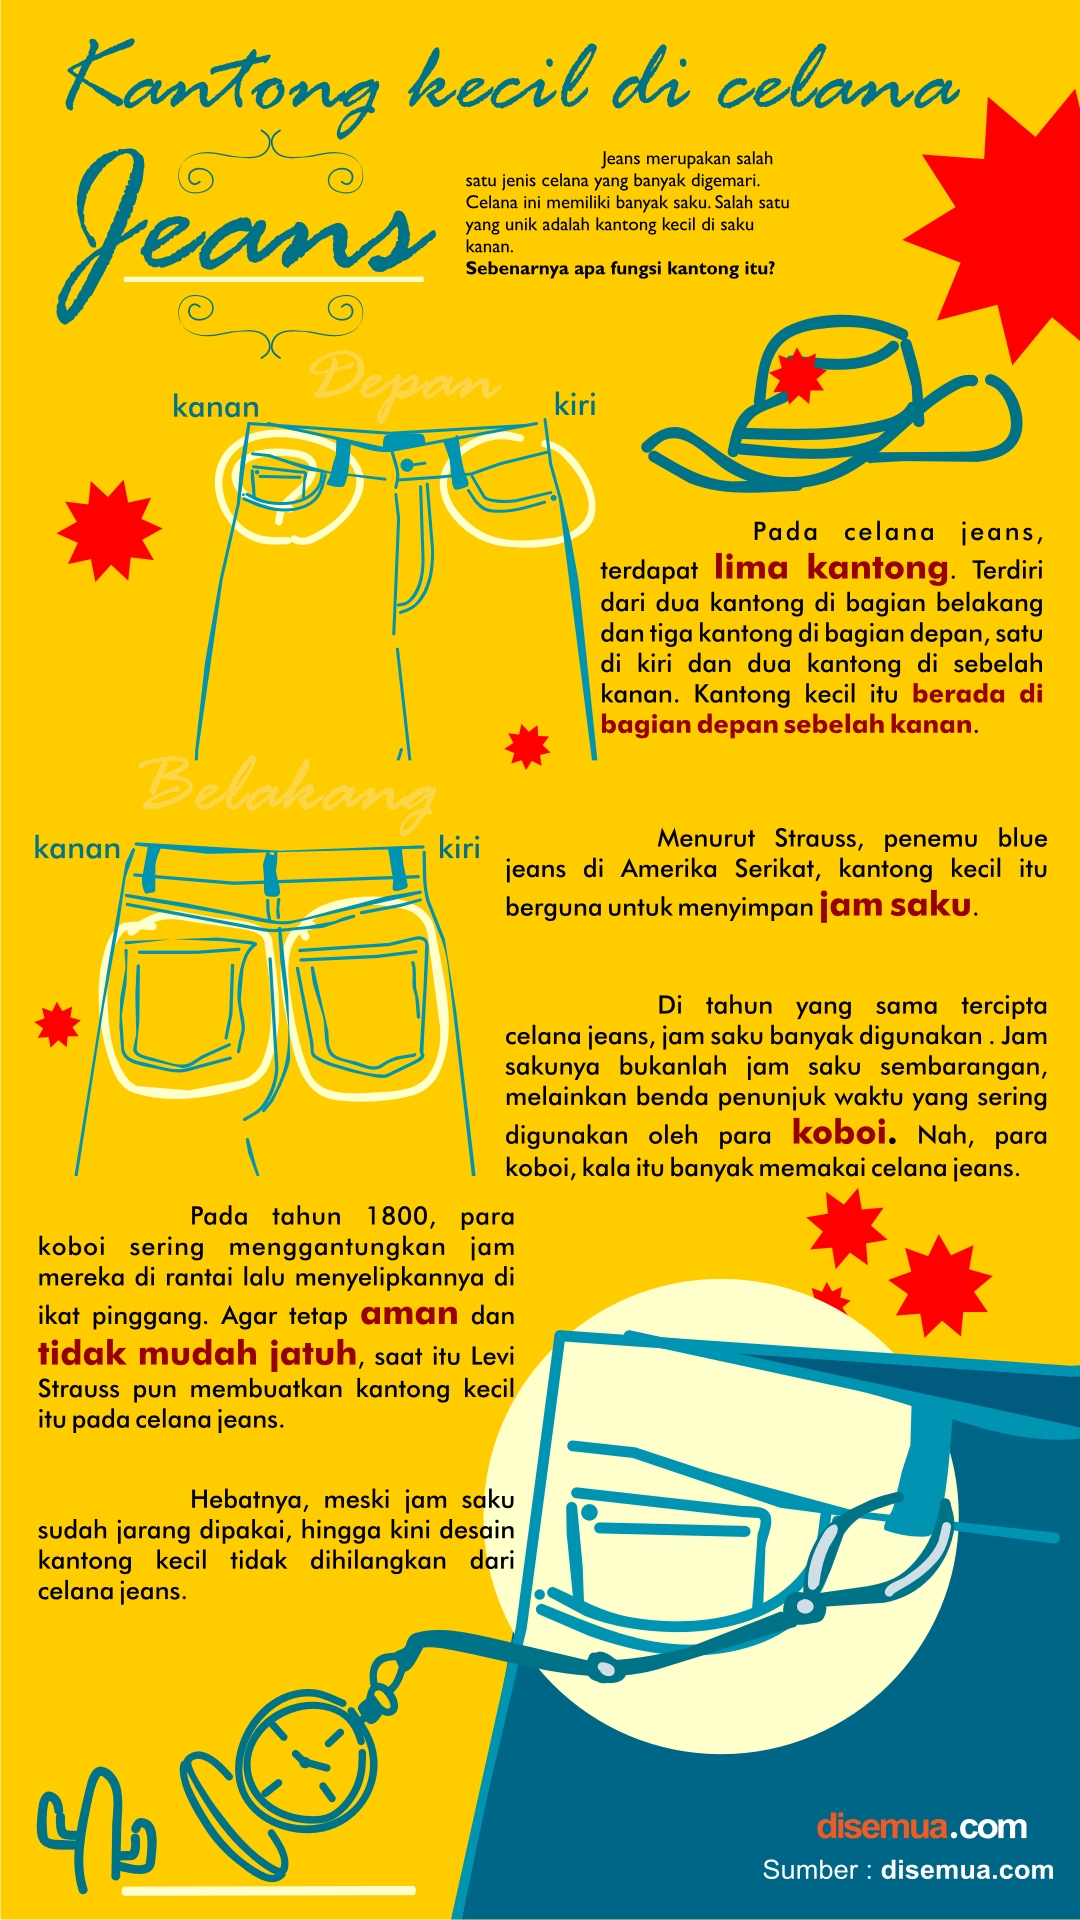 Fungsi Kantong Kecil Celana Jeans